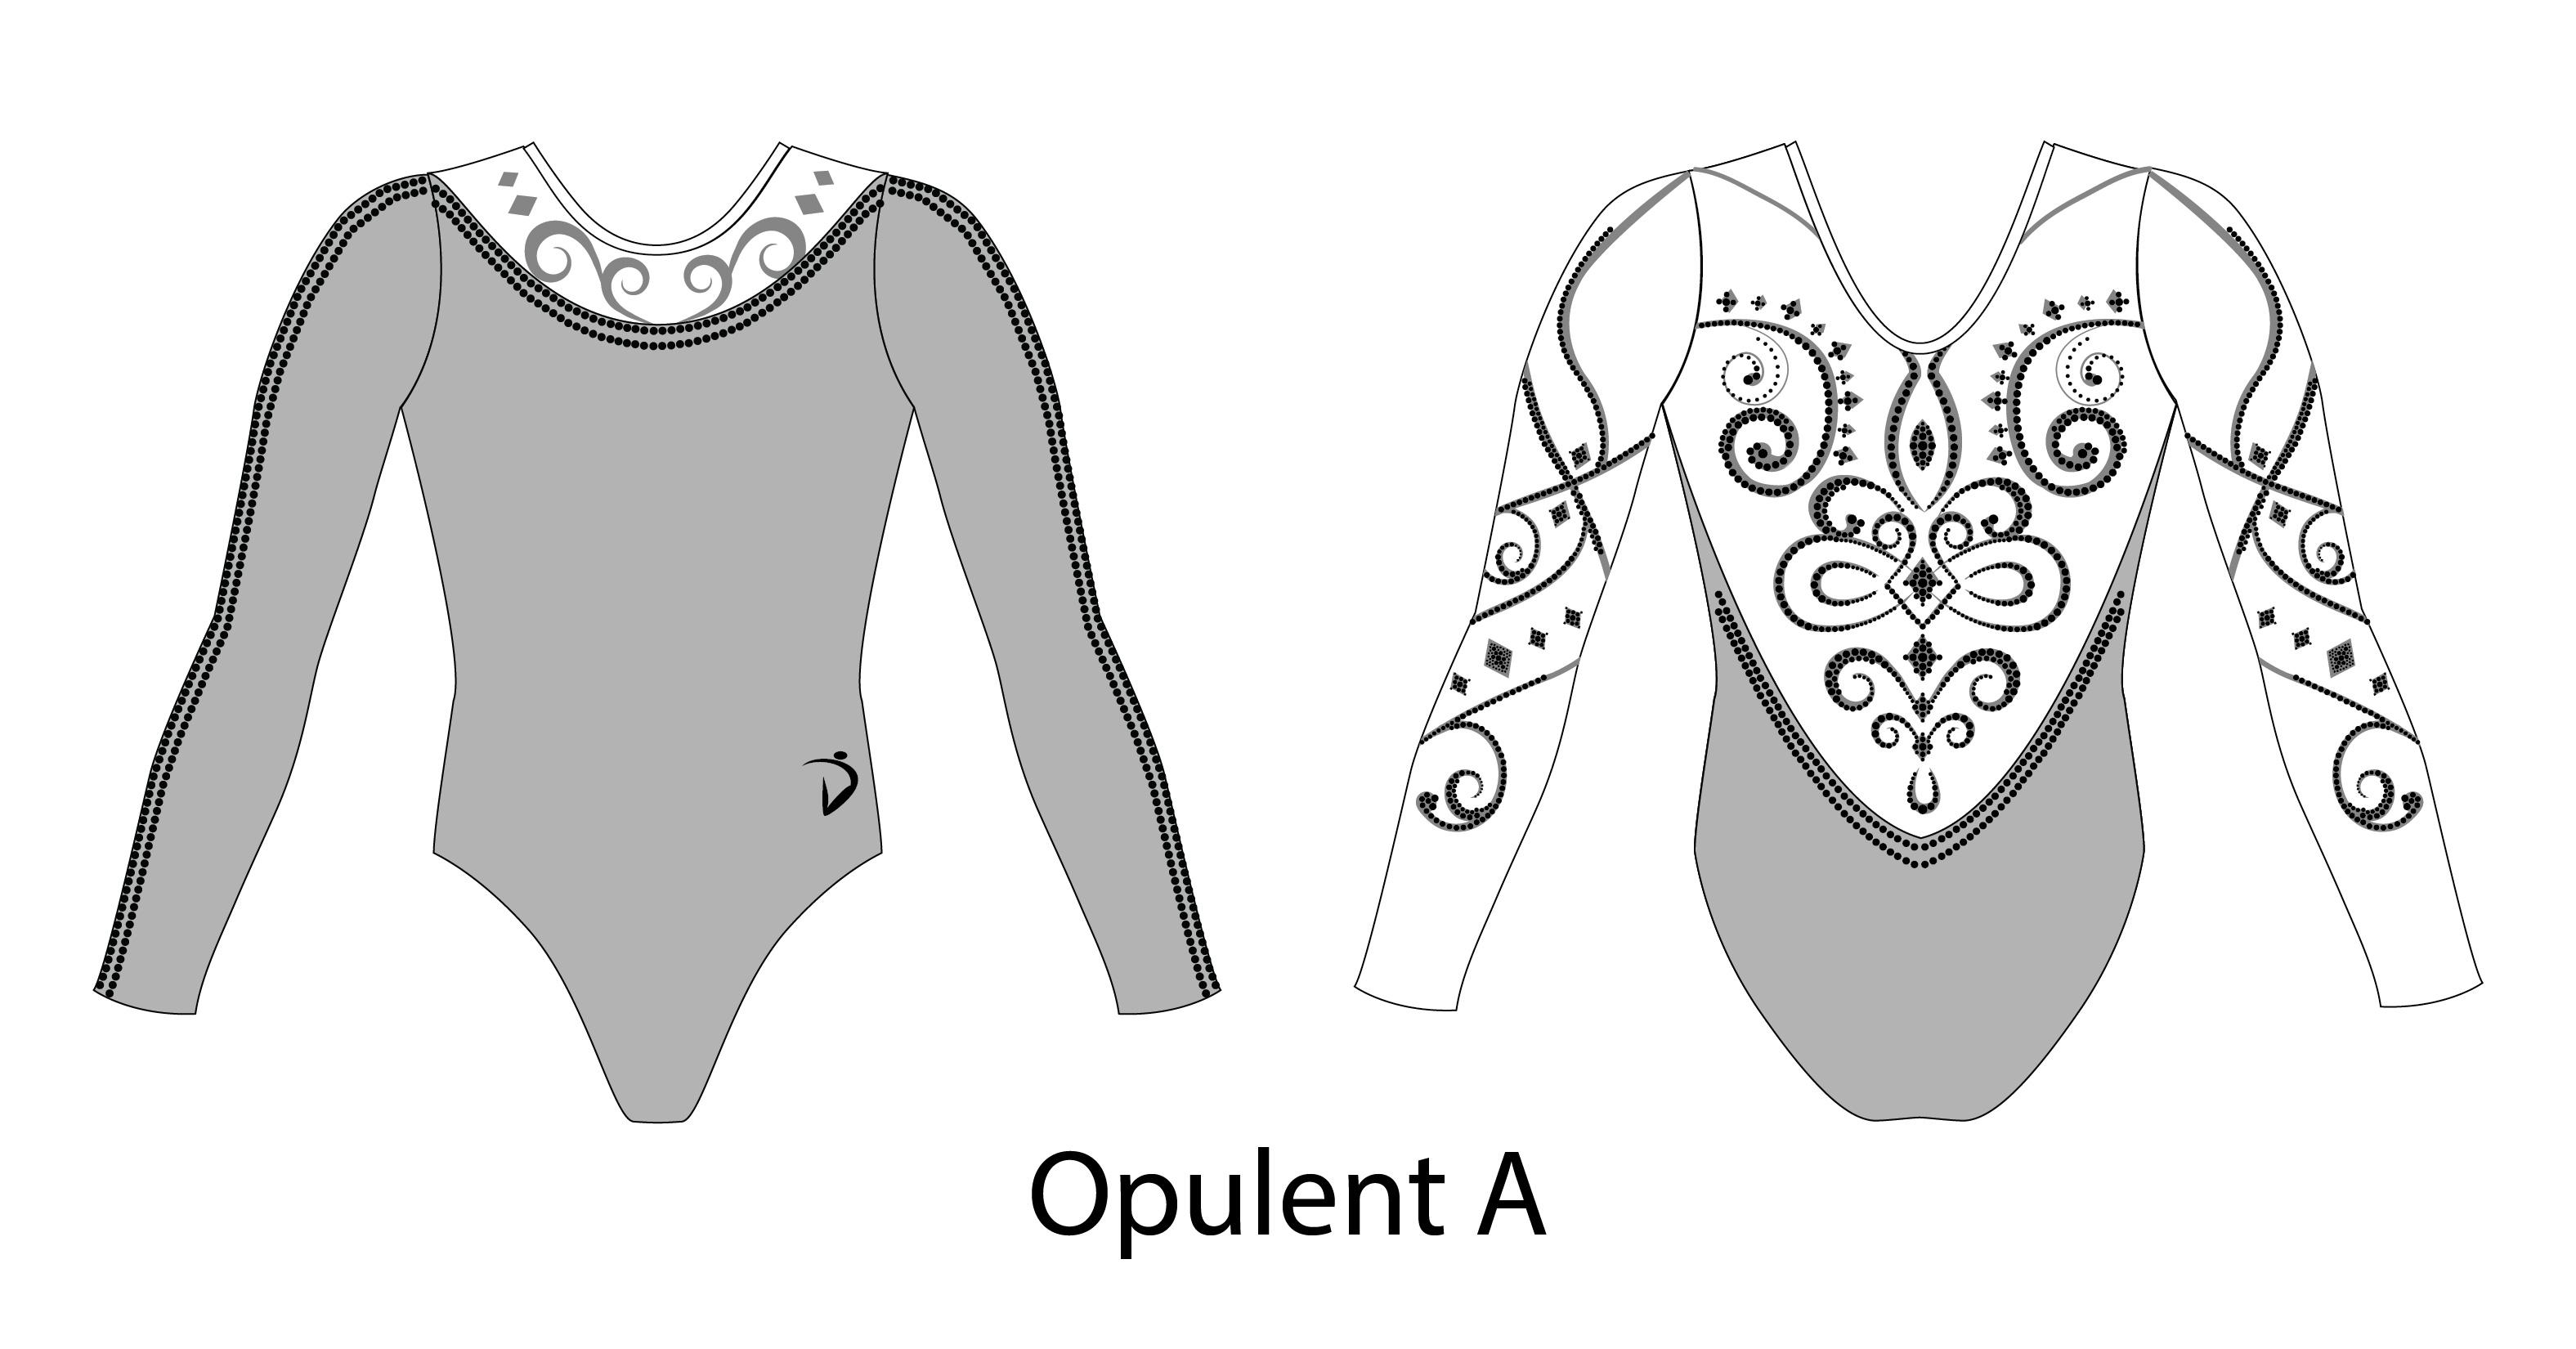 Opulent A